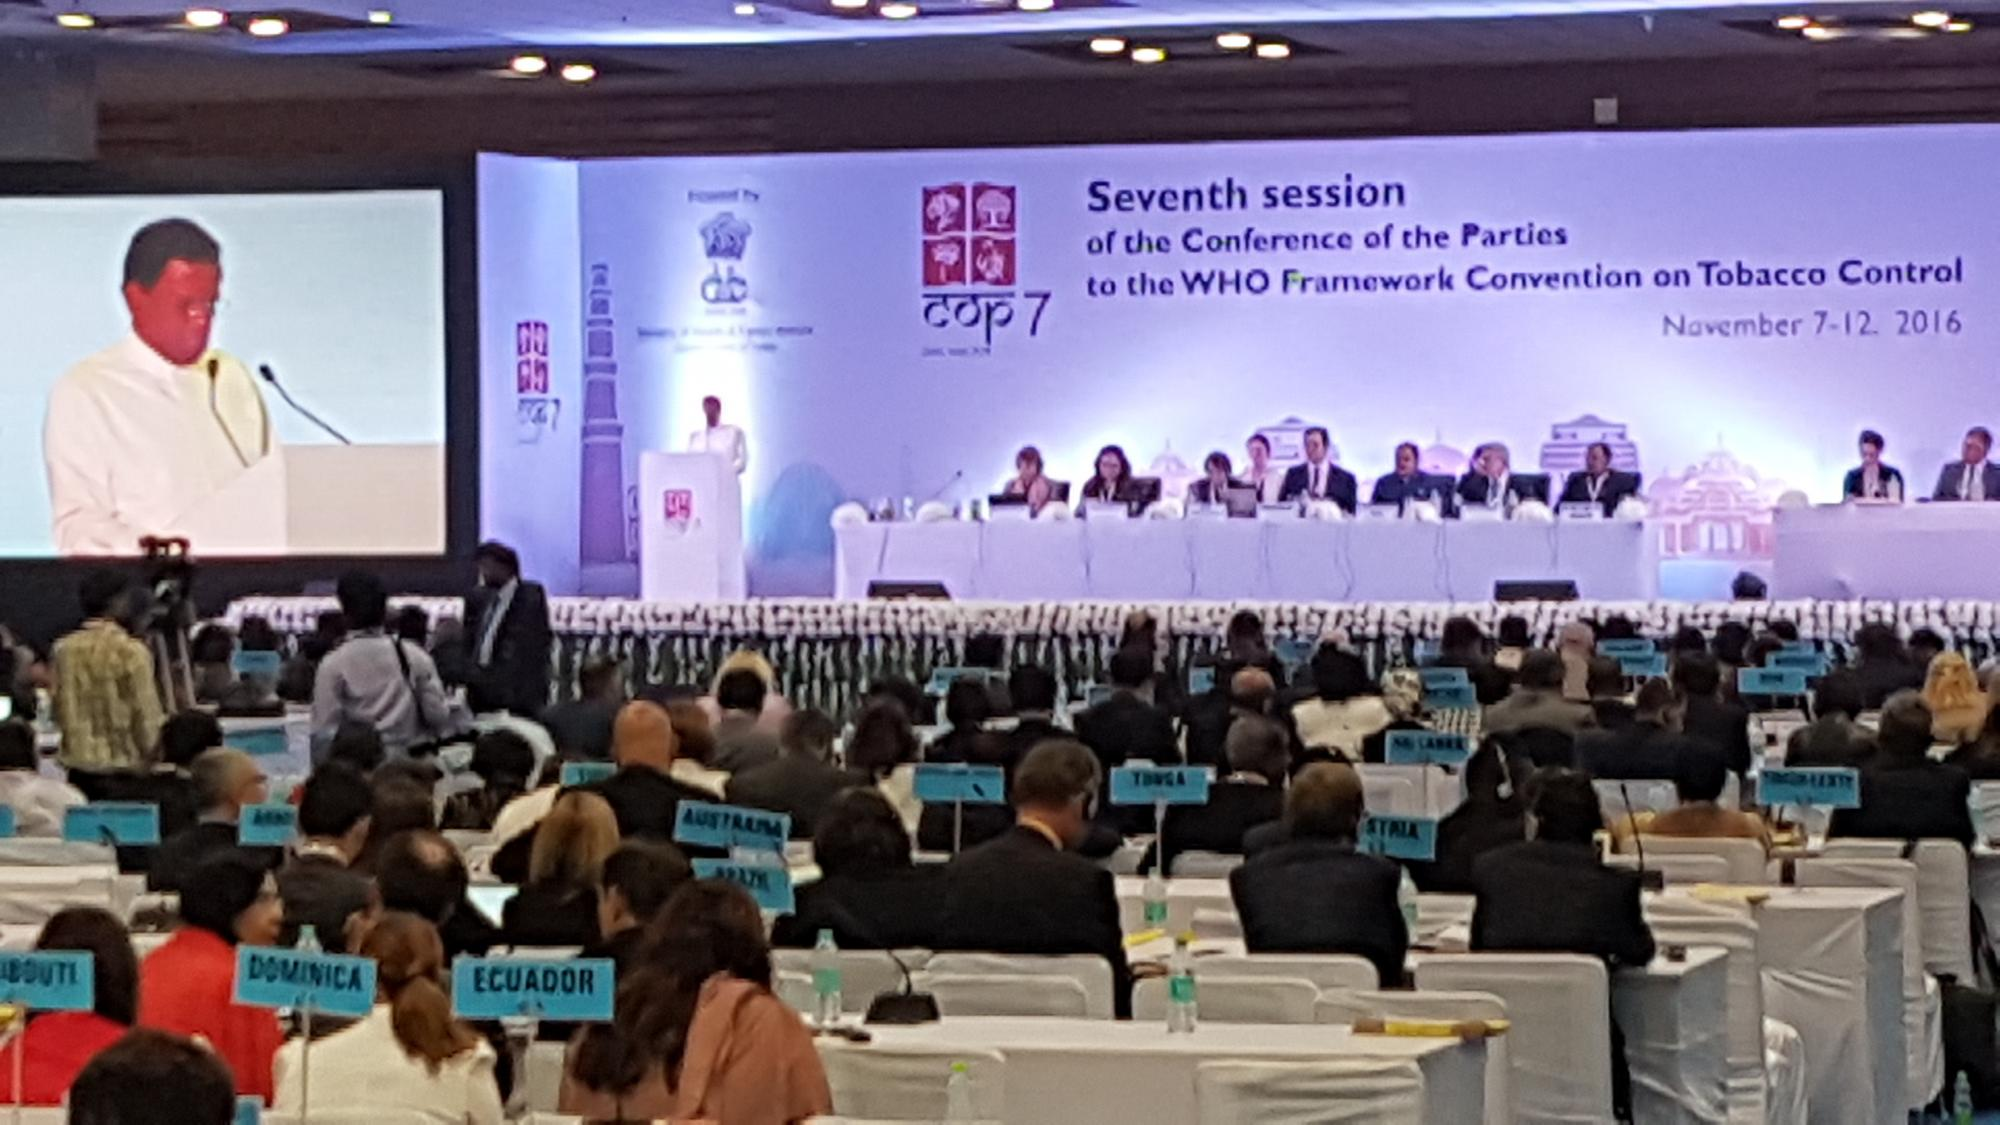 COP7 realizada na Índia traz avanços para os produtores de tabaco brasileiros